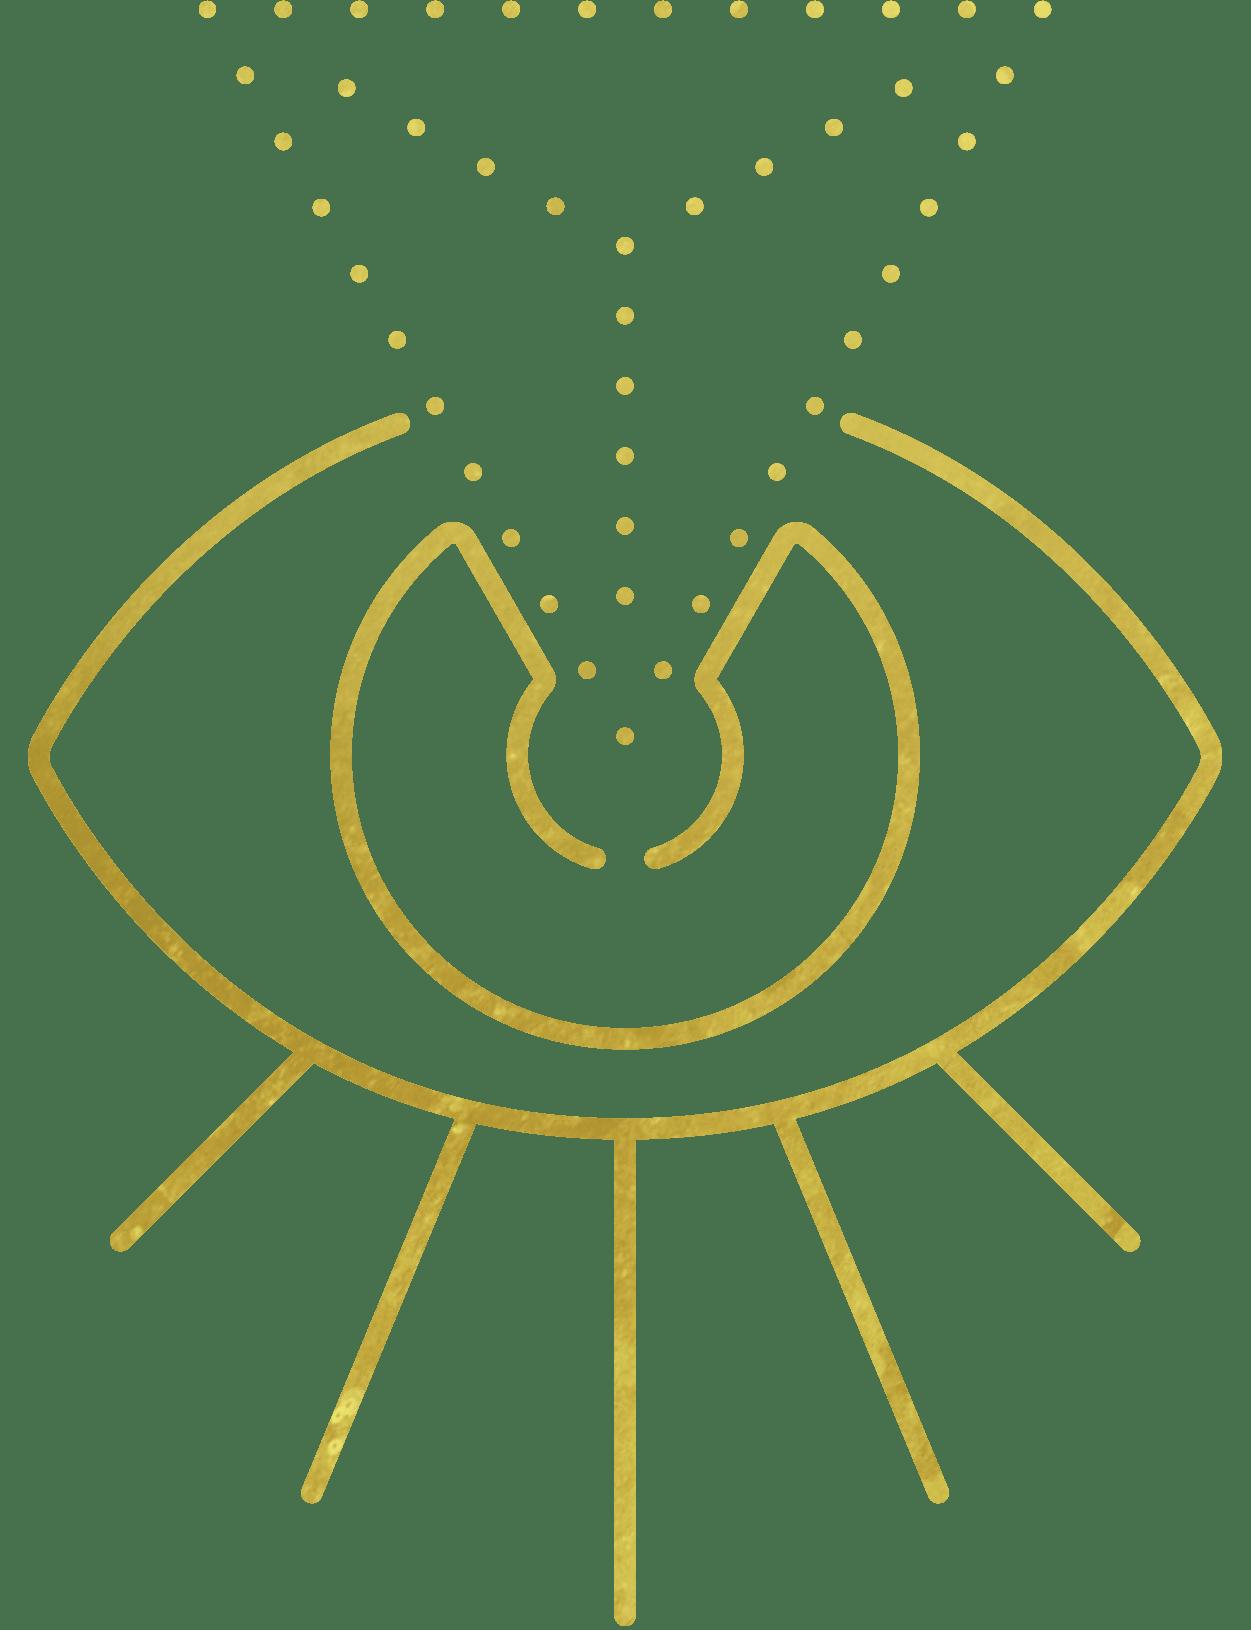 BGCre8 design eye icon